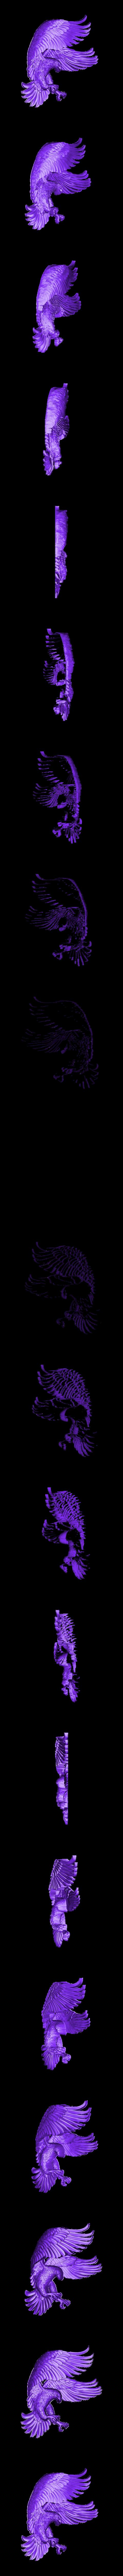 1288.stl Download free STL file eagle 3d stl relief model • 3D printable design, stlfilesfree